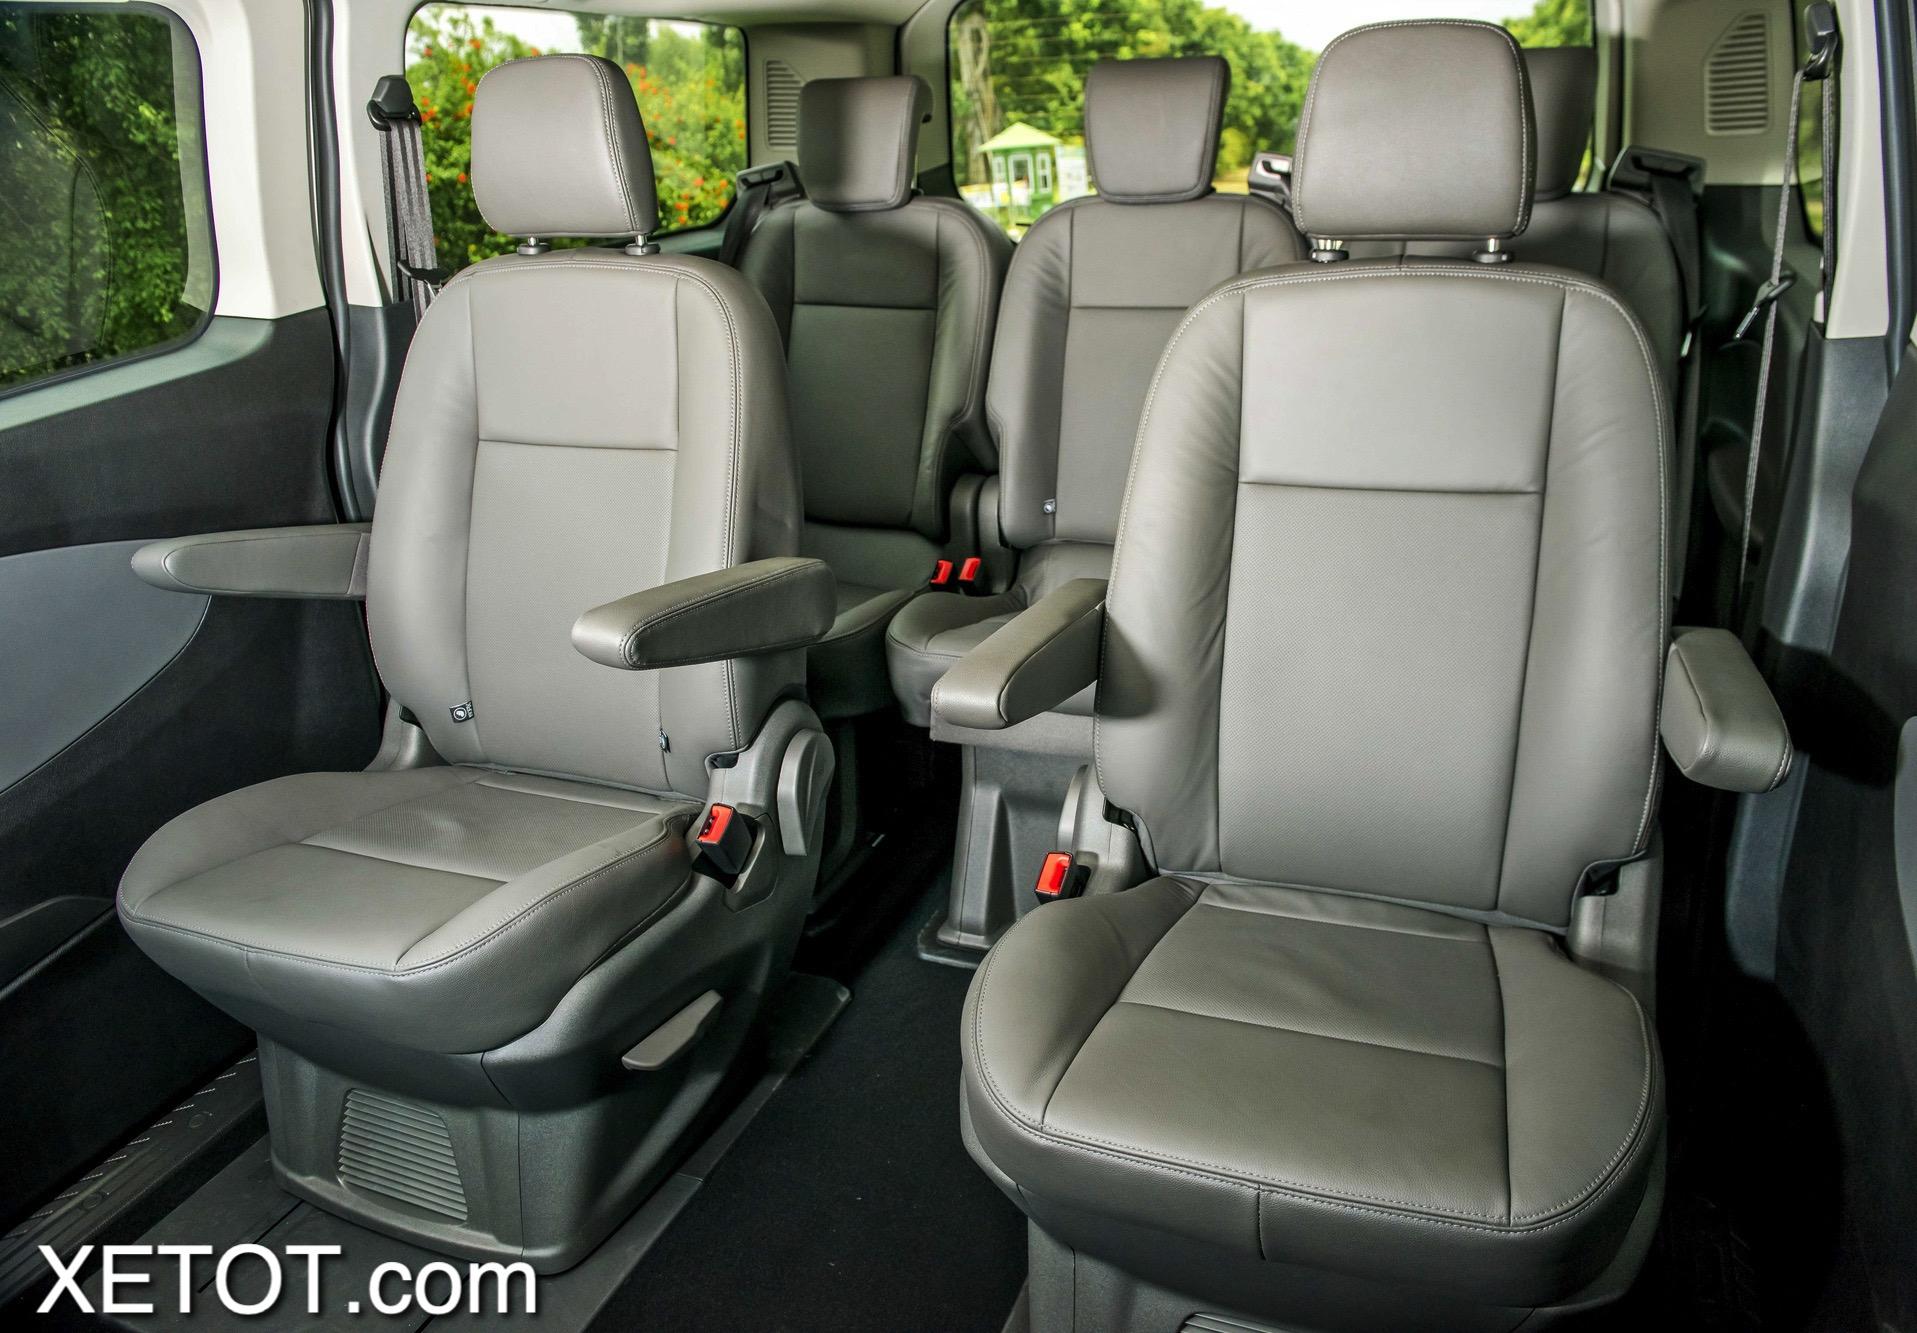 hang-ghe-xe-ford-tourneo-2021-xe-7-cho-xetot-com-1